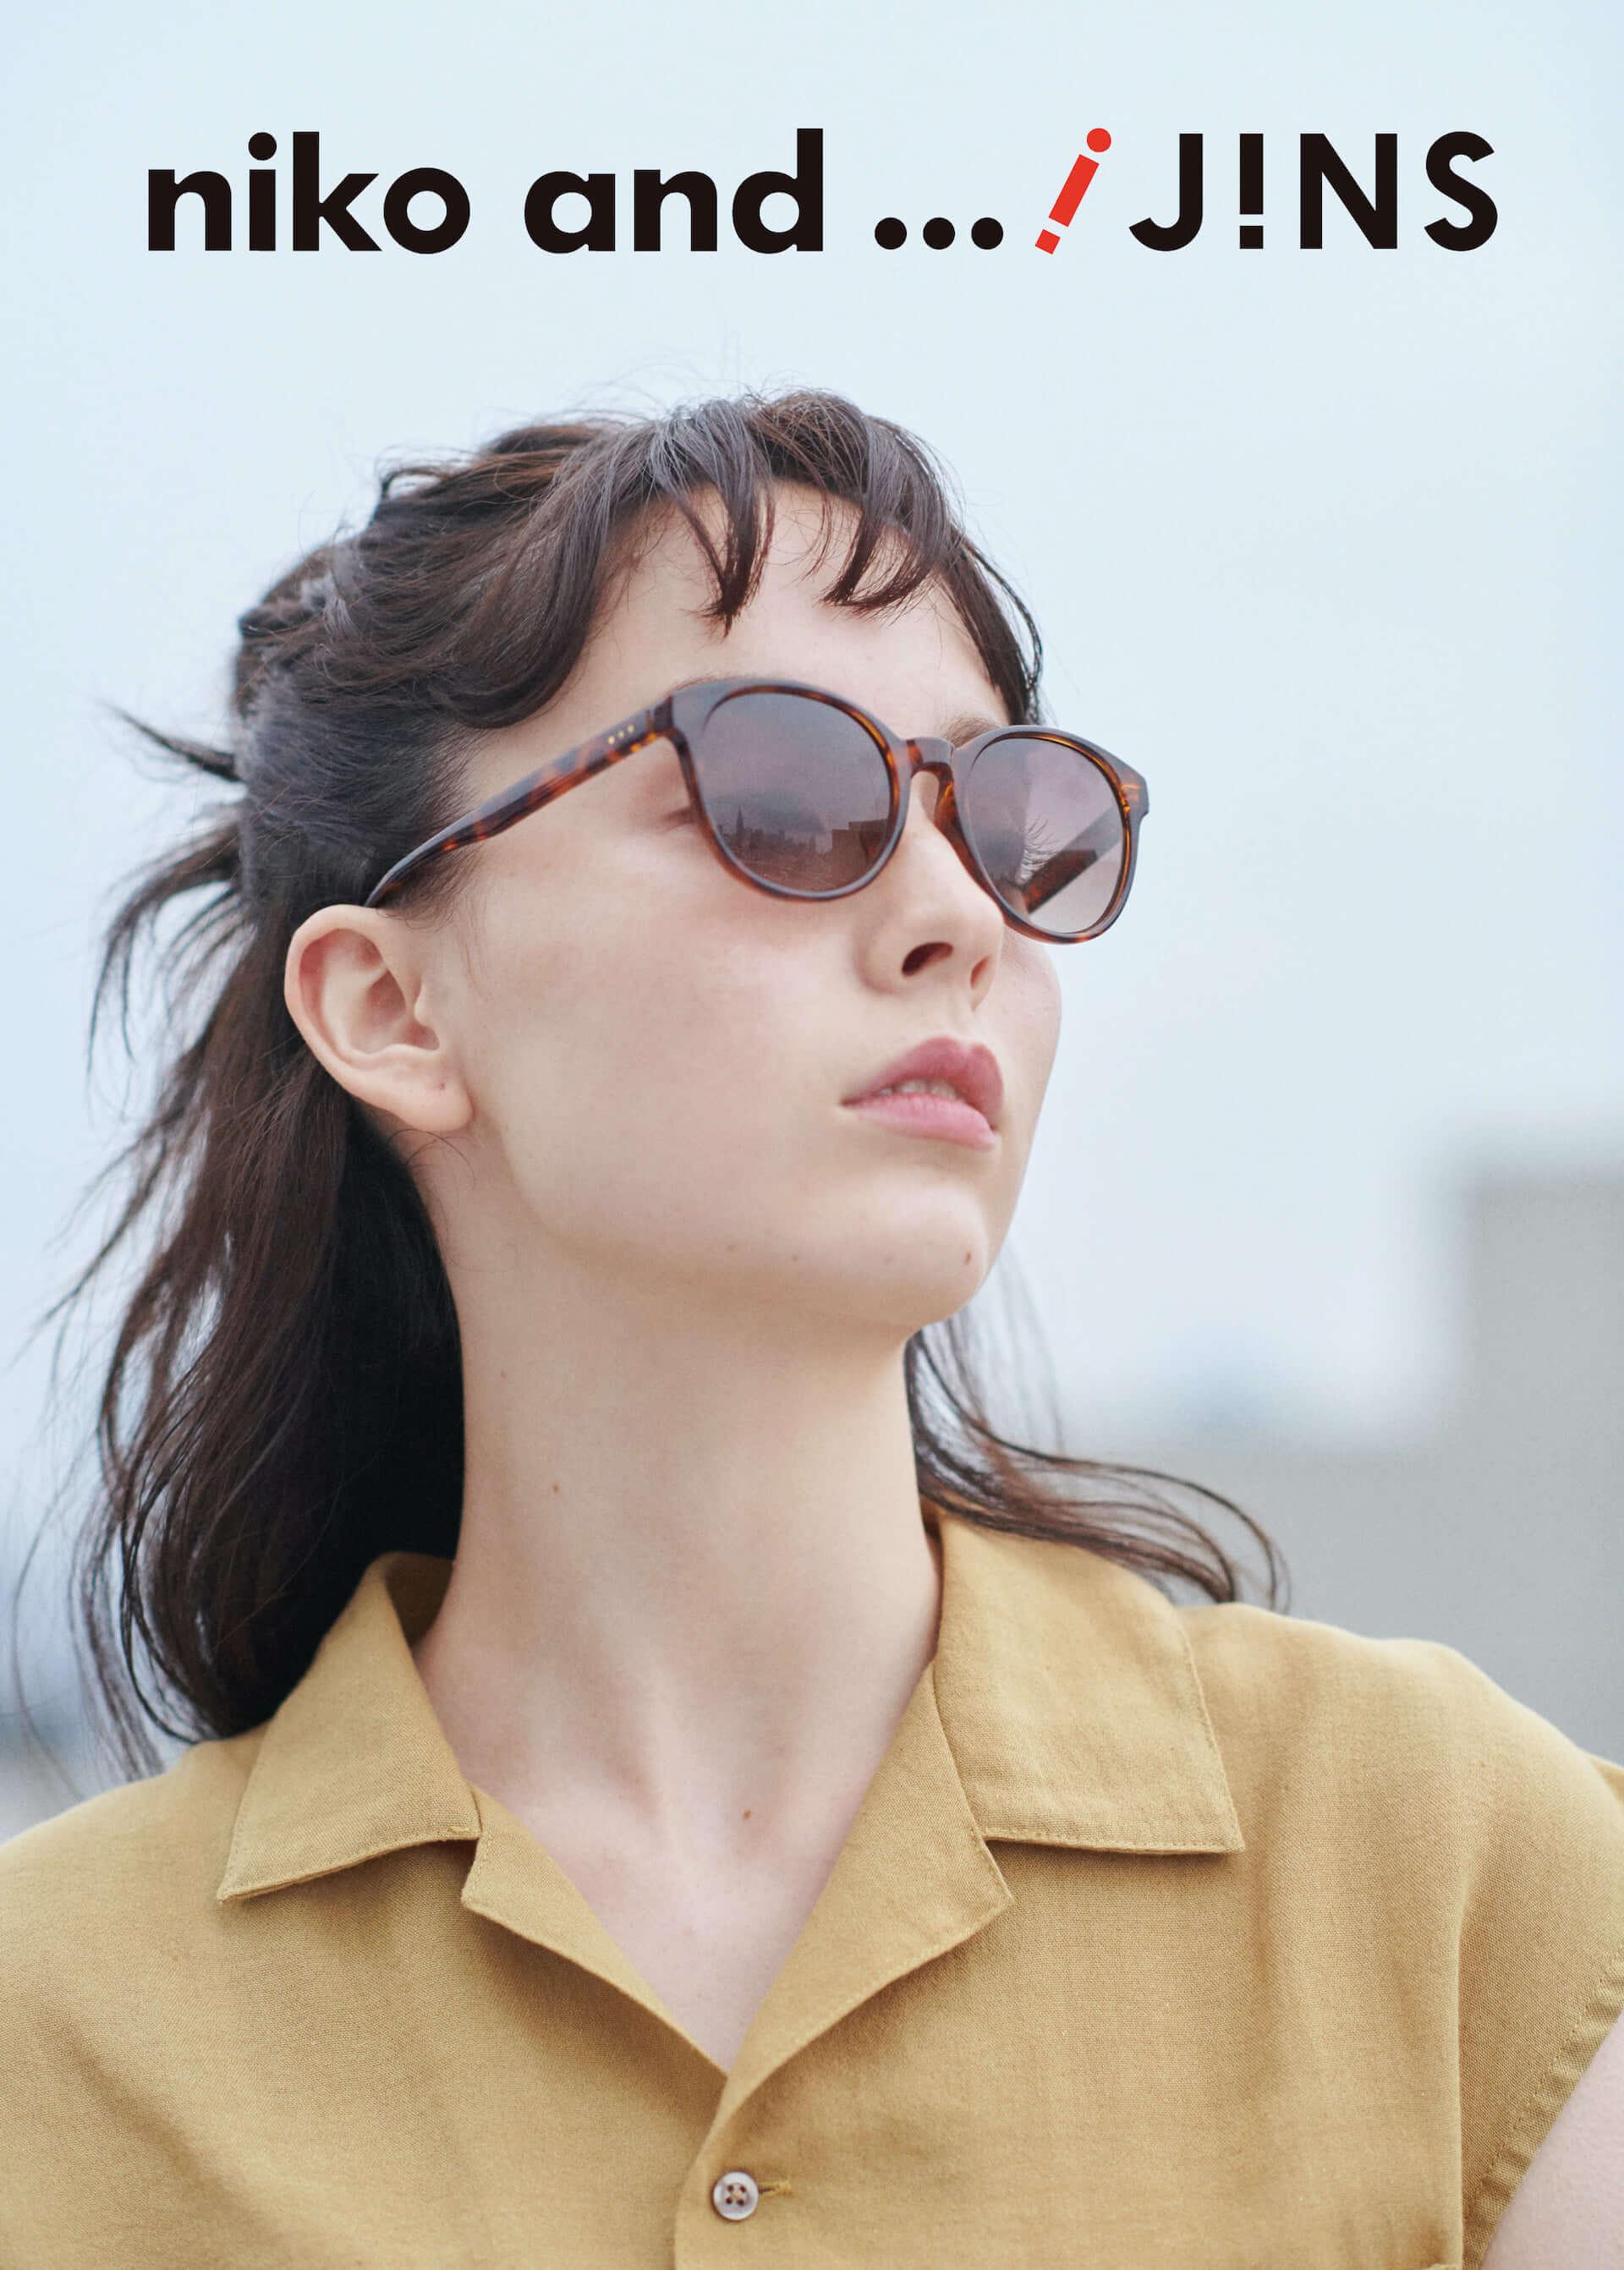 niko and …とJINSのコラボアイテム最新作が発売!ブルーライトカットメガネやクラウンパントも登場 lf200421_nikoand_1-1920x2684